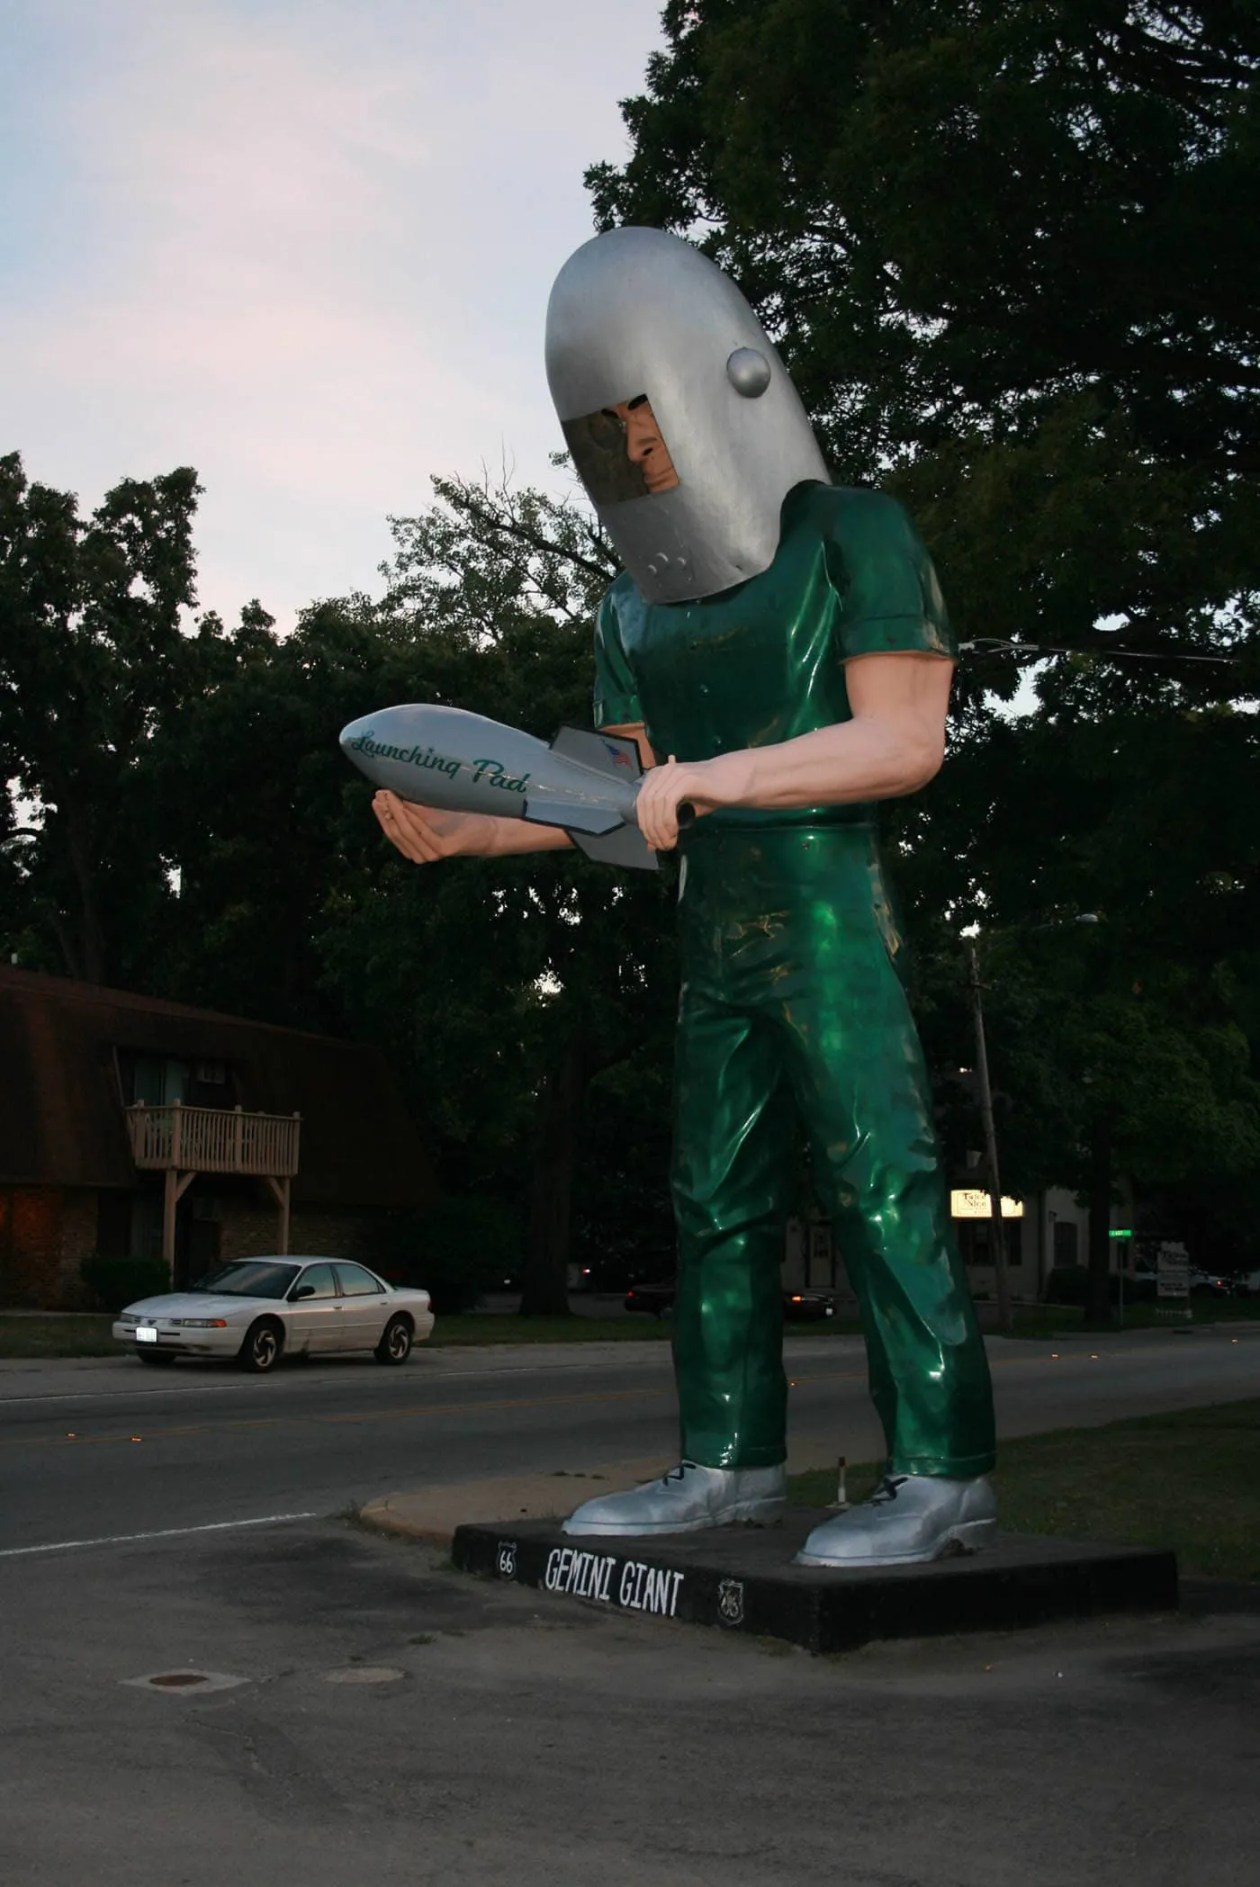 Gemini Giant muffler man at the Launching Pad in Wilmington, Illinois